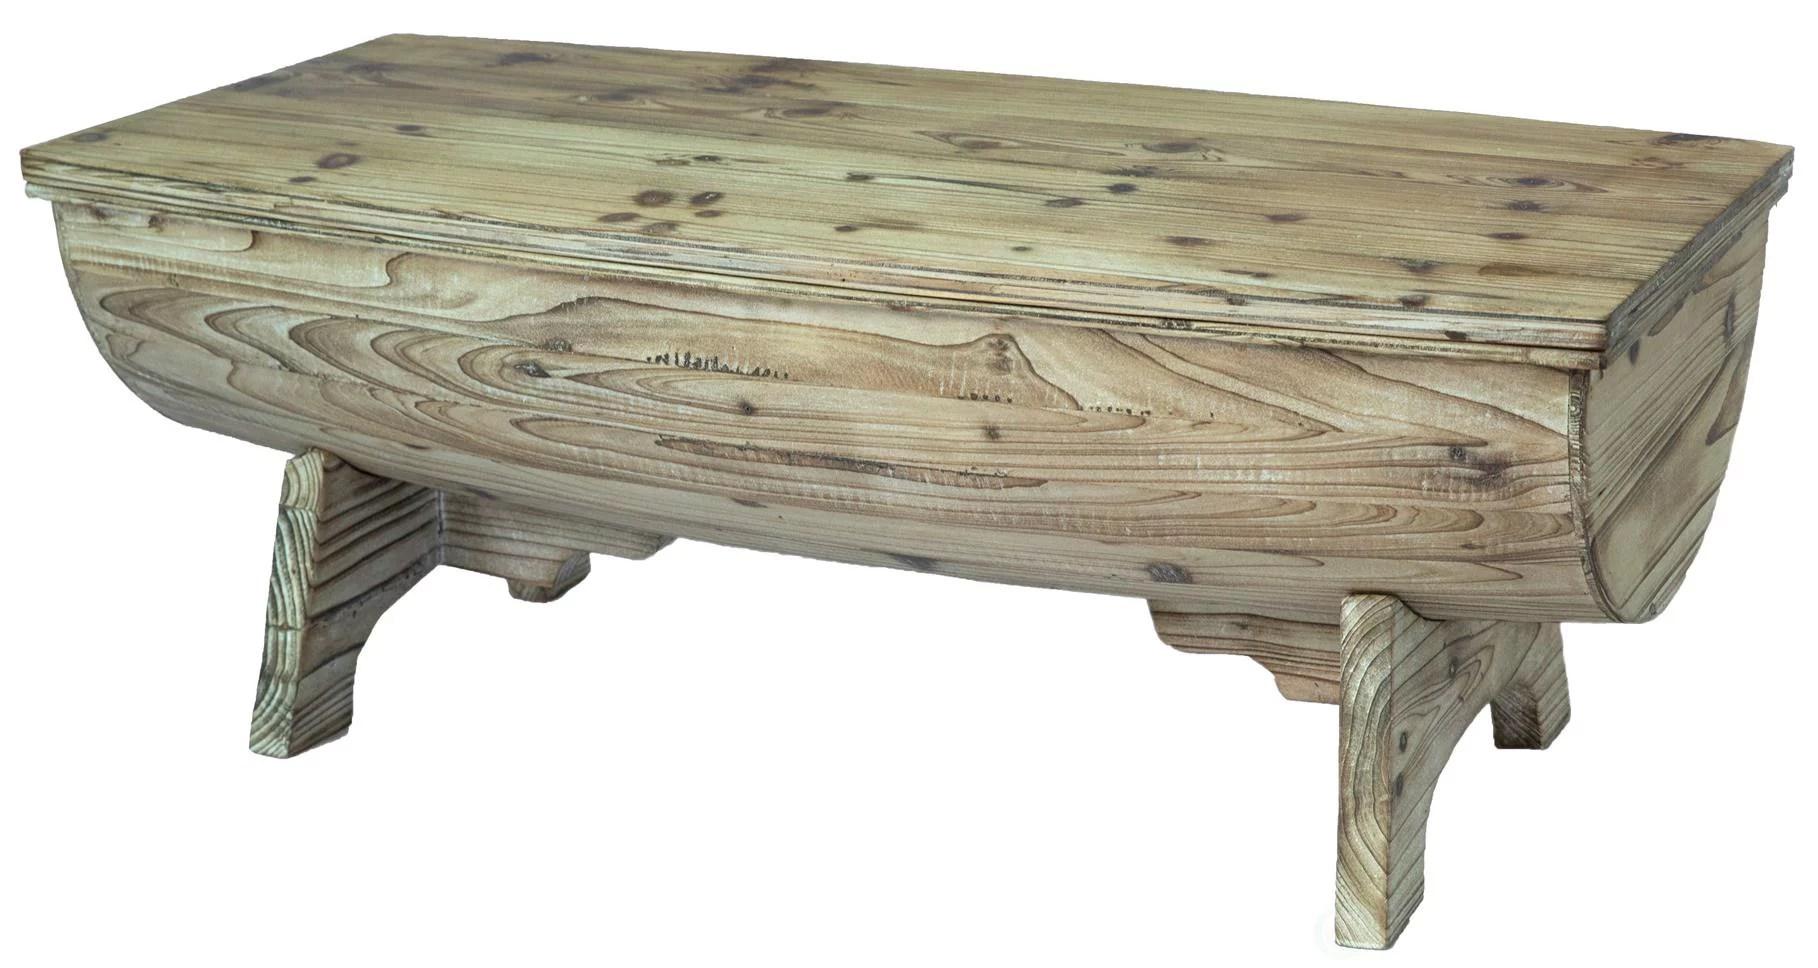 vintage wooden wine barrel coffee table with interior storage